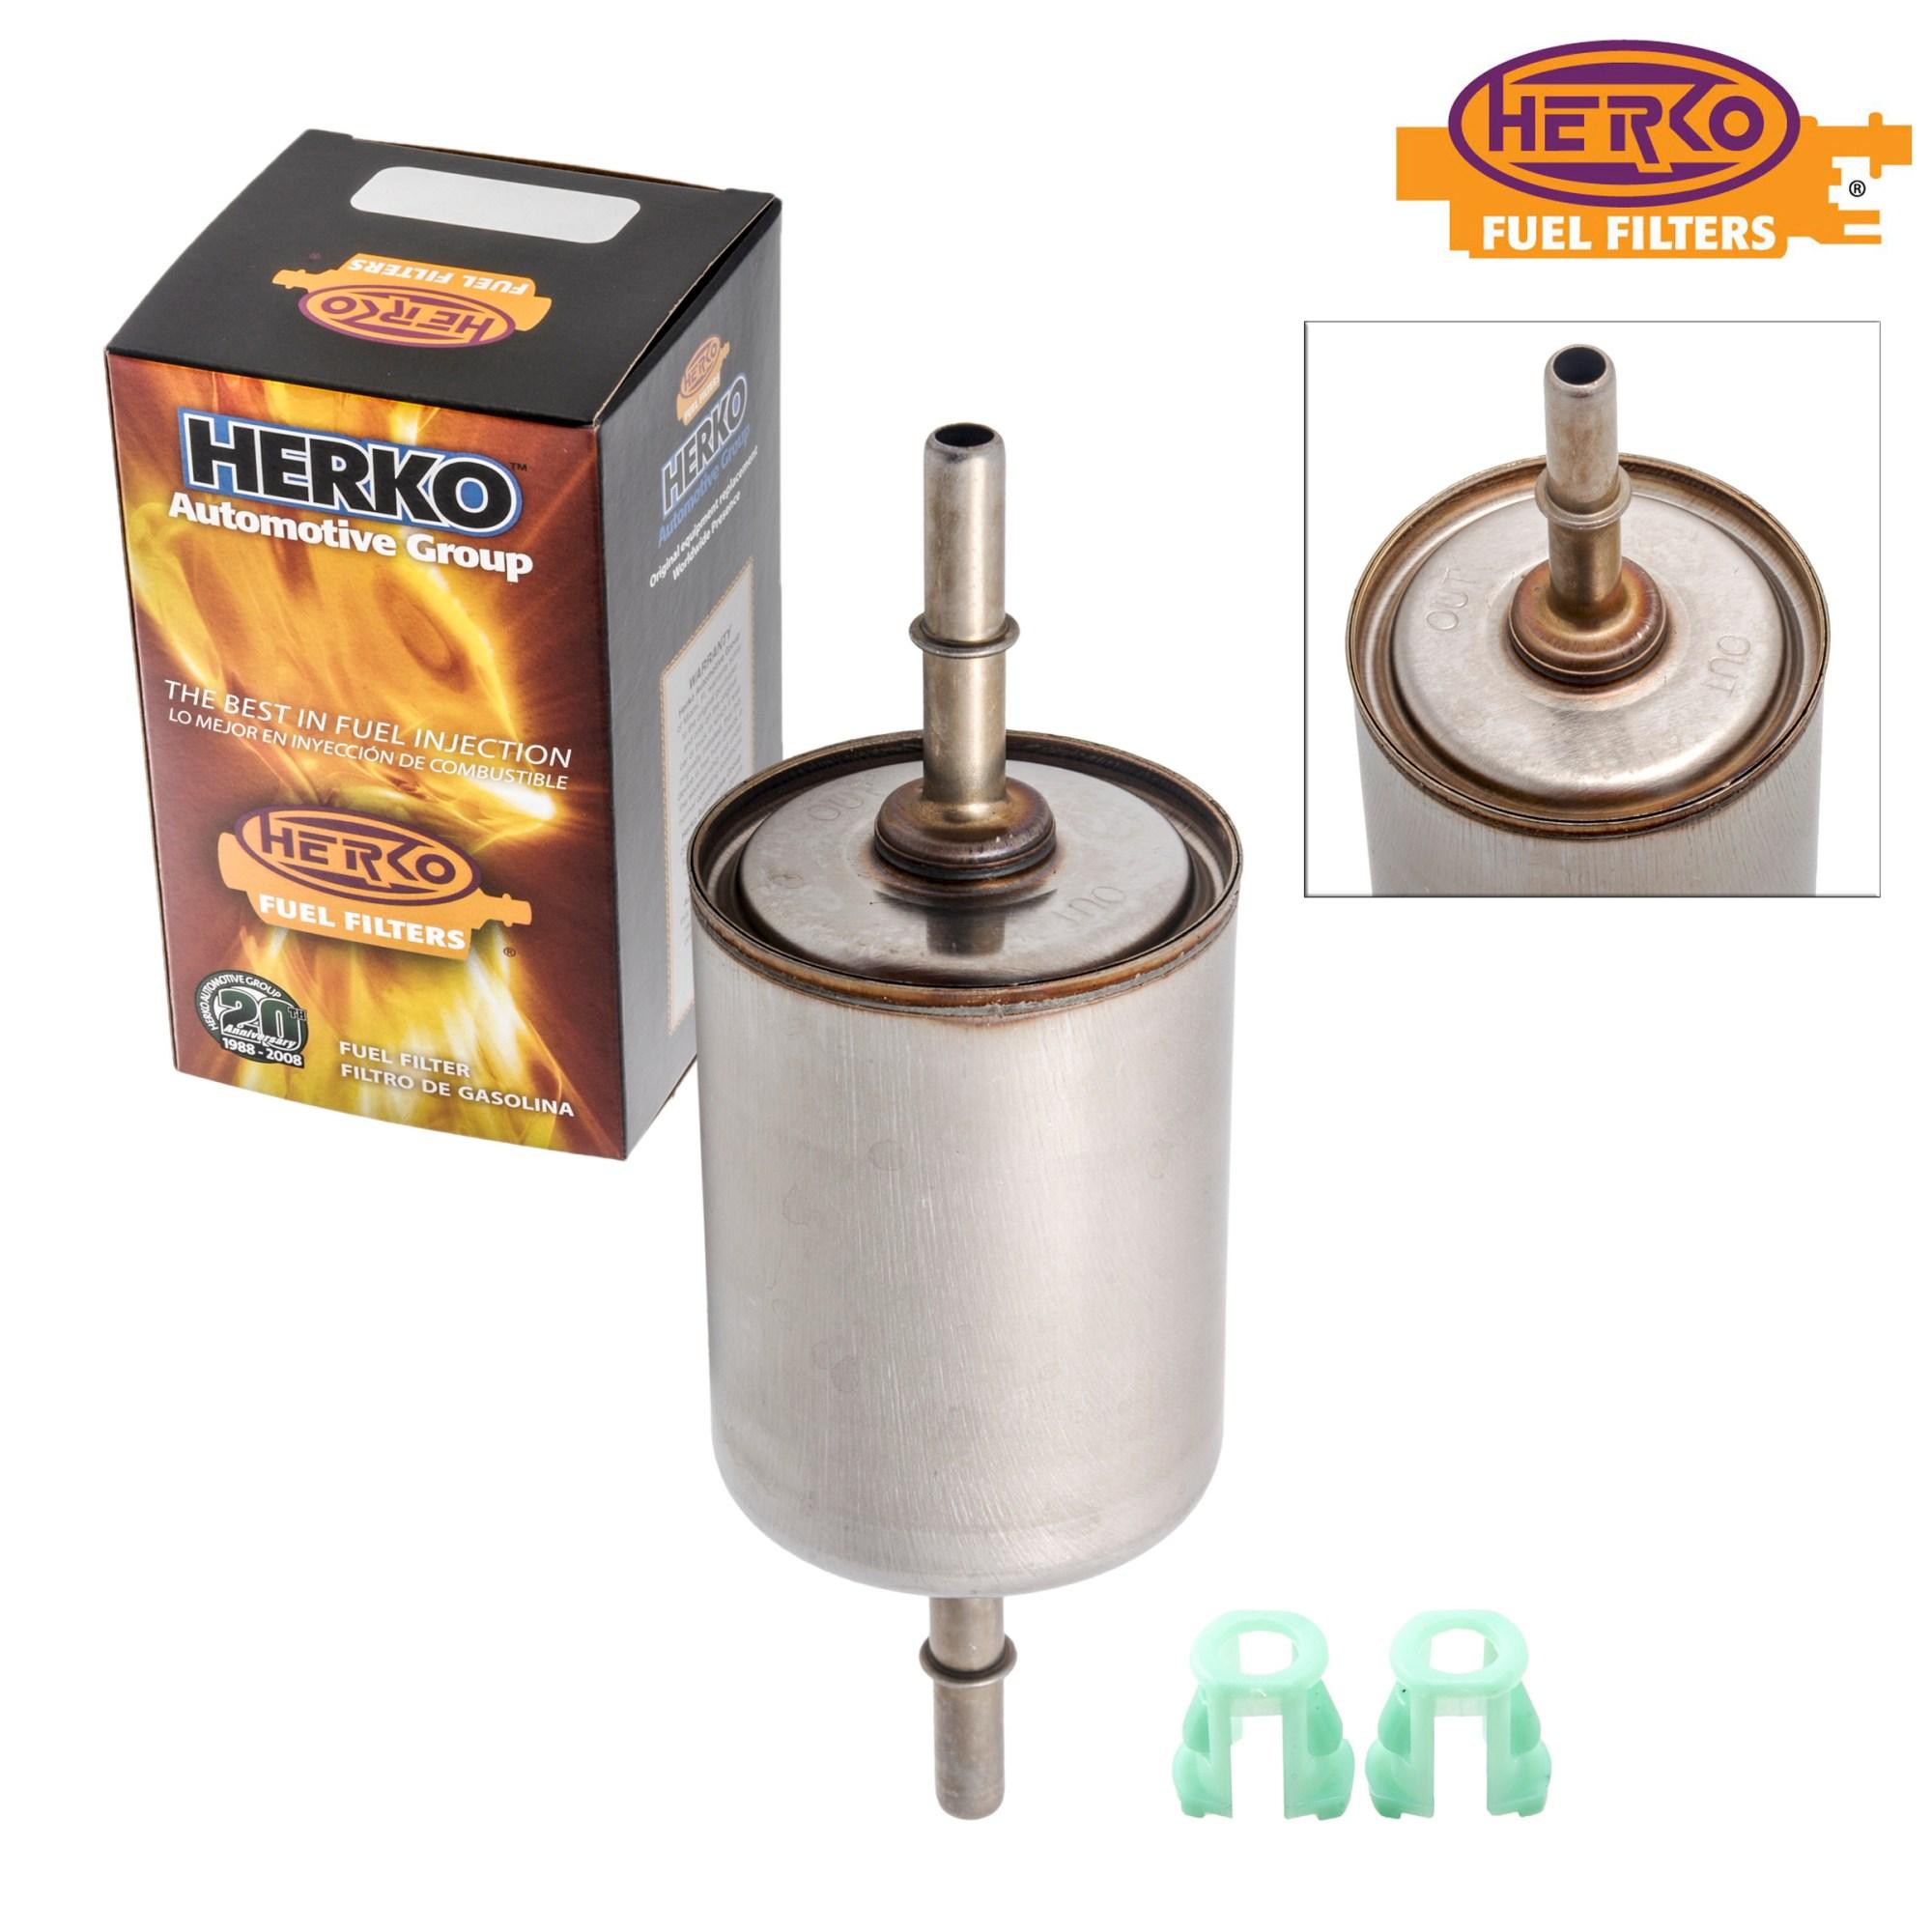 hight resolution of details about herko fuel filter fgm01 for daewoo saab jaguar buick oldsmobile cadillac 90 07